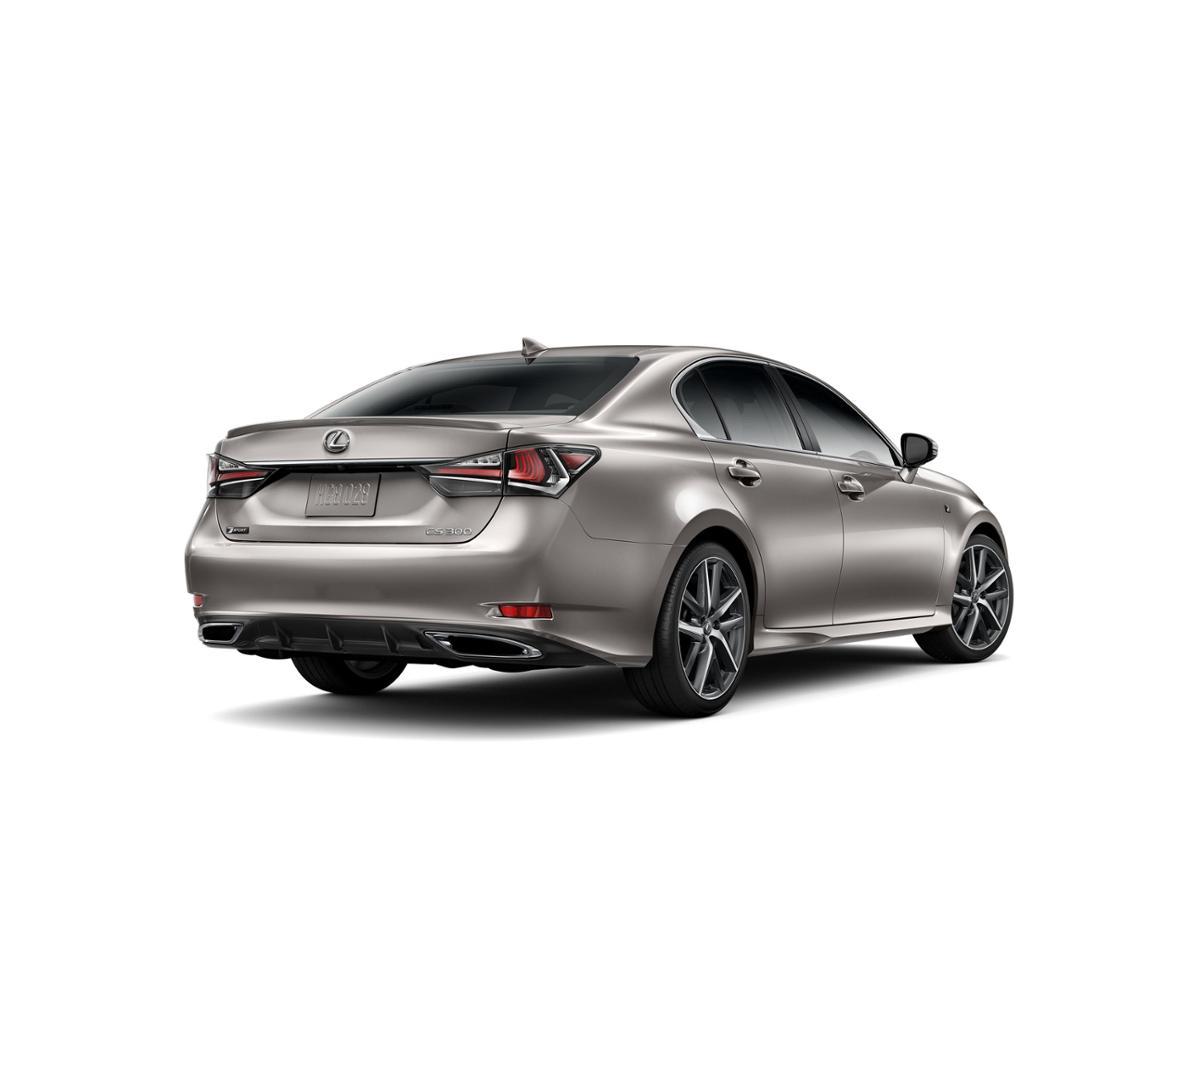 Lexus Gs For Sale: New 2018 Lexus GS 350 For Sale In Modesto, CA